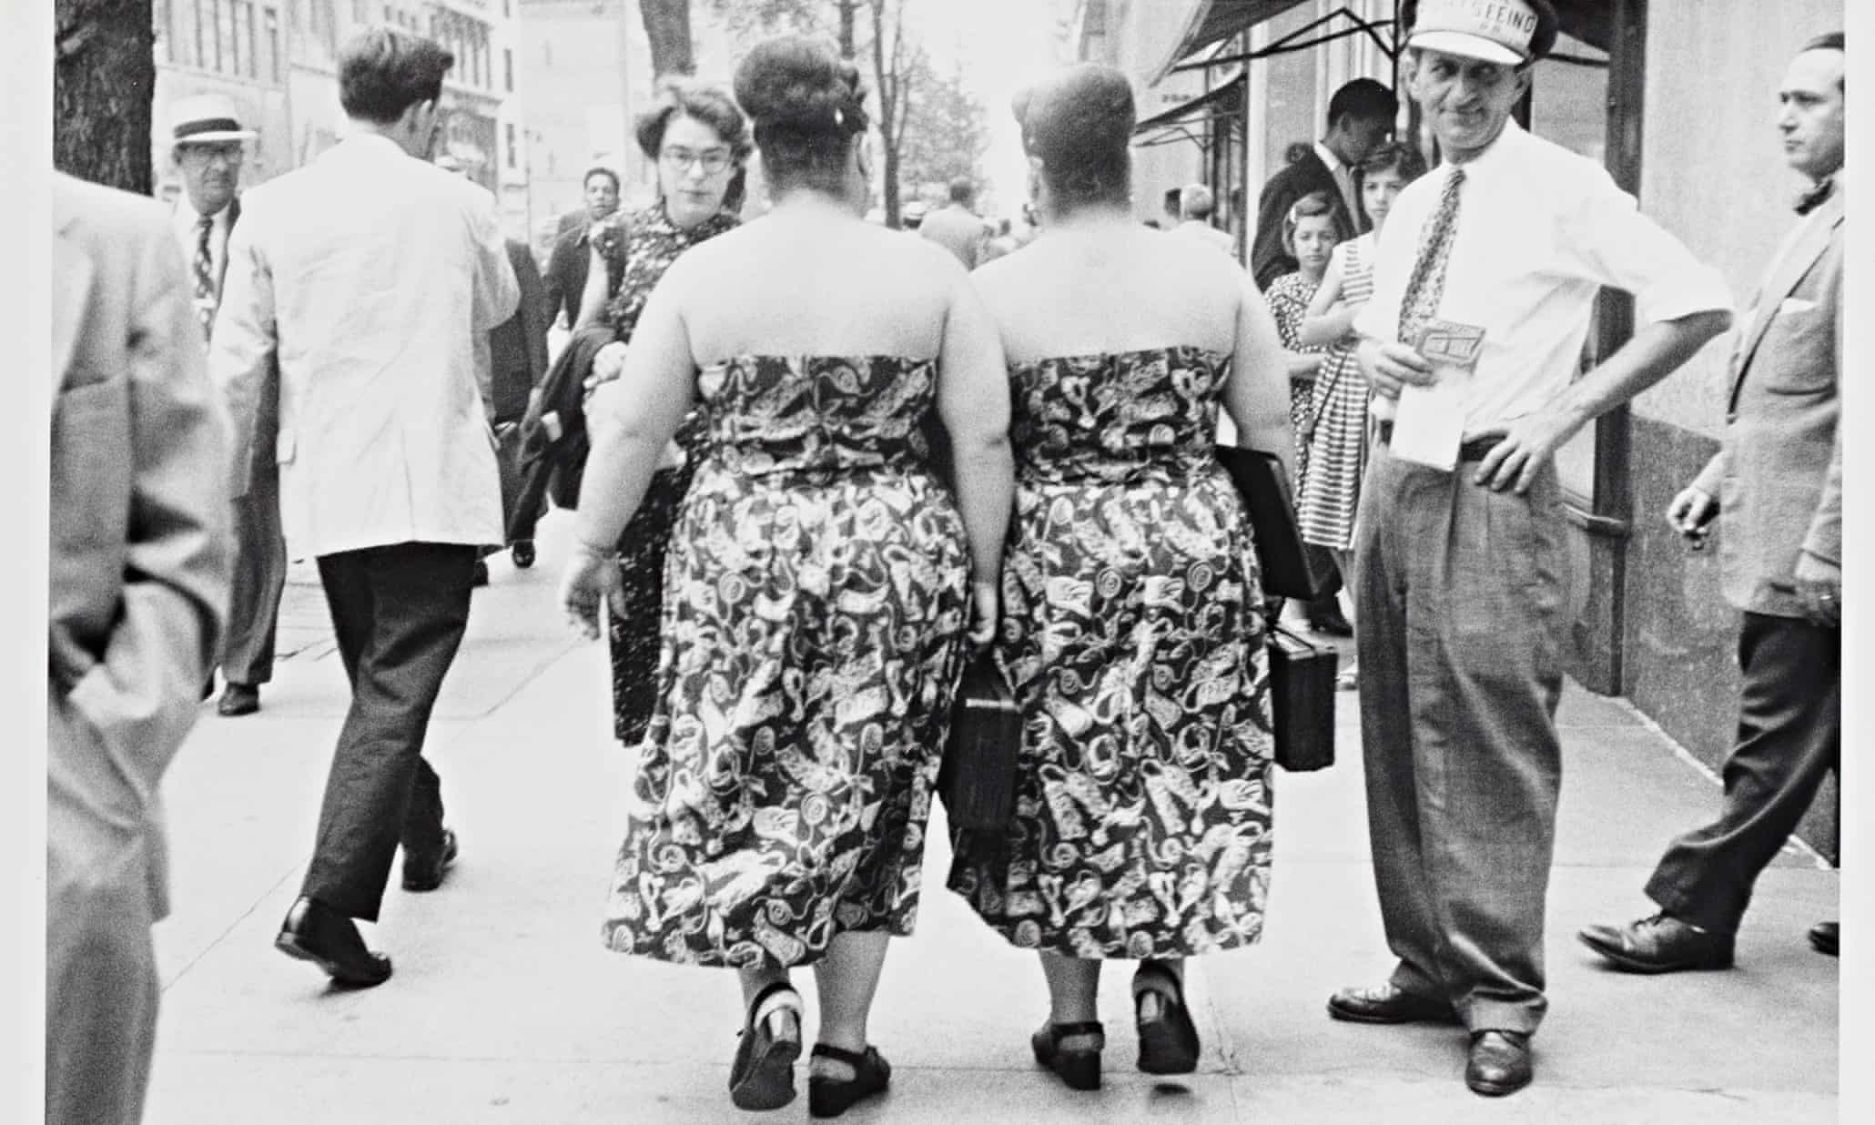 Twins in Cleveland, Robert Frank photos